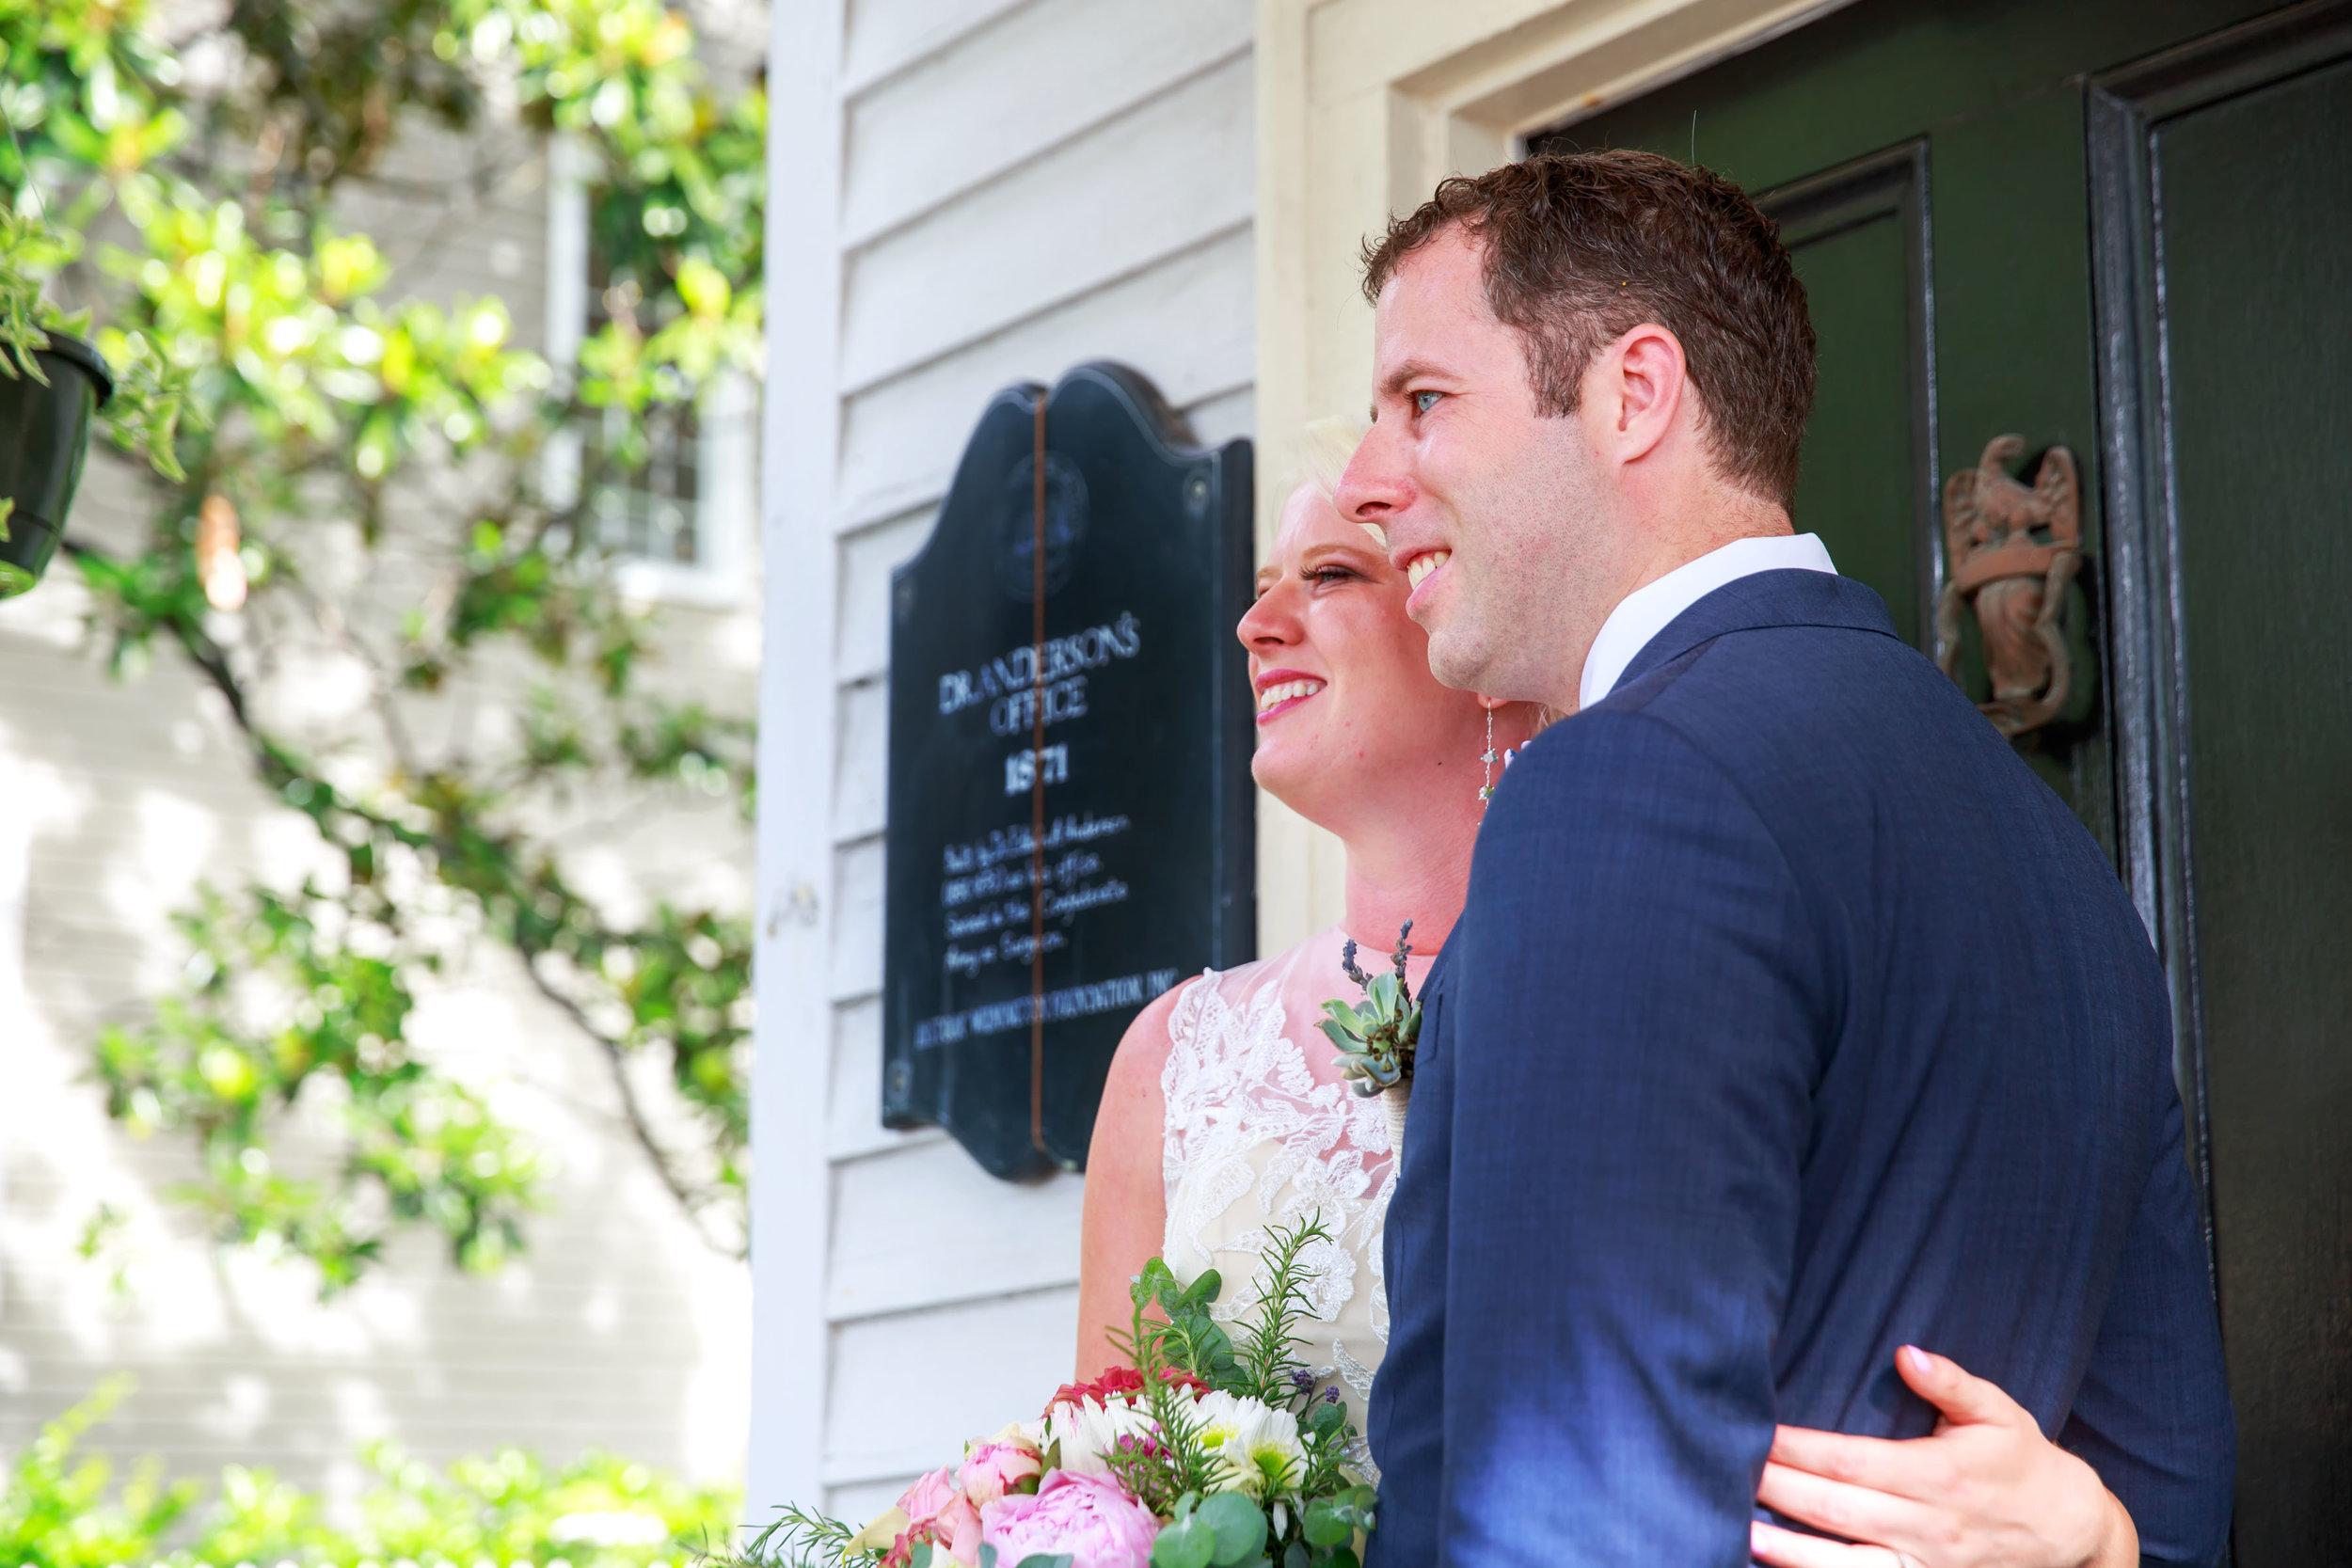 128-South-Wedding-Tiffany-Abruzzo-Photography-Bride-&-Groom-40.jpg